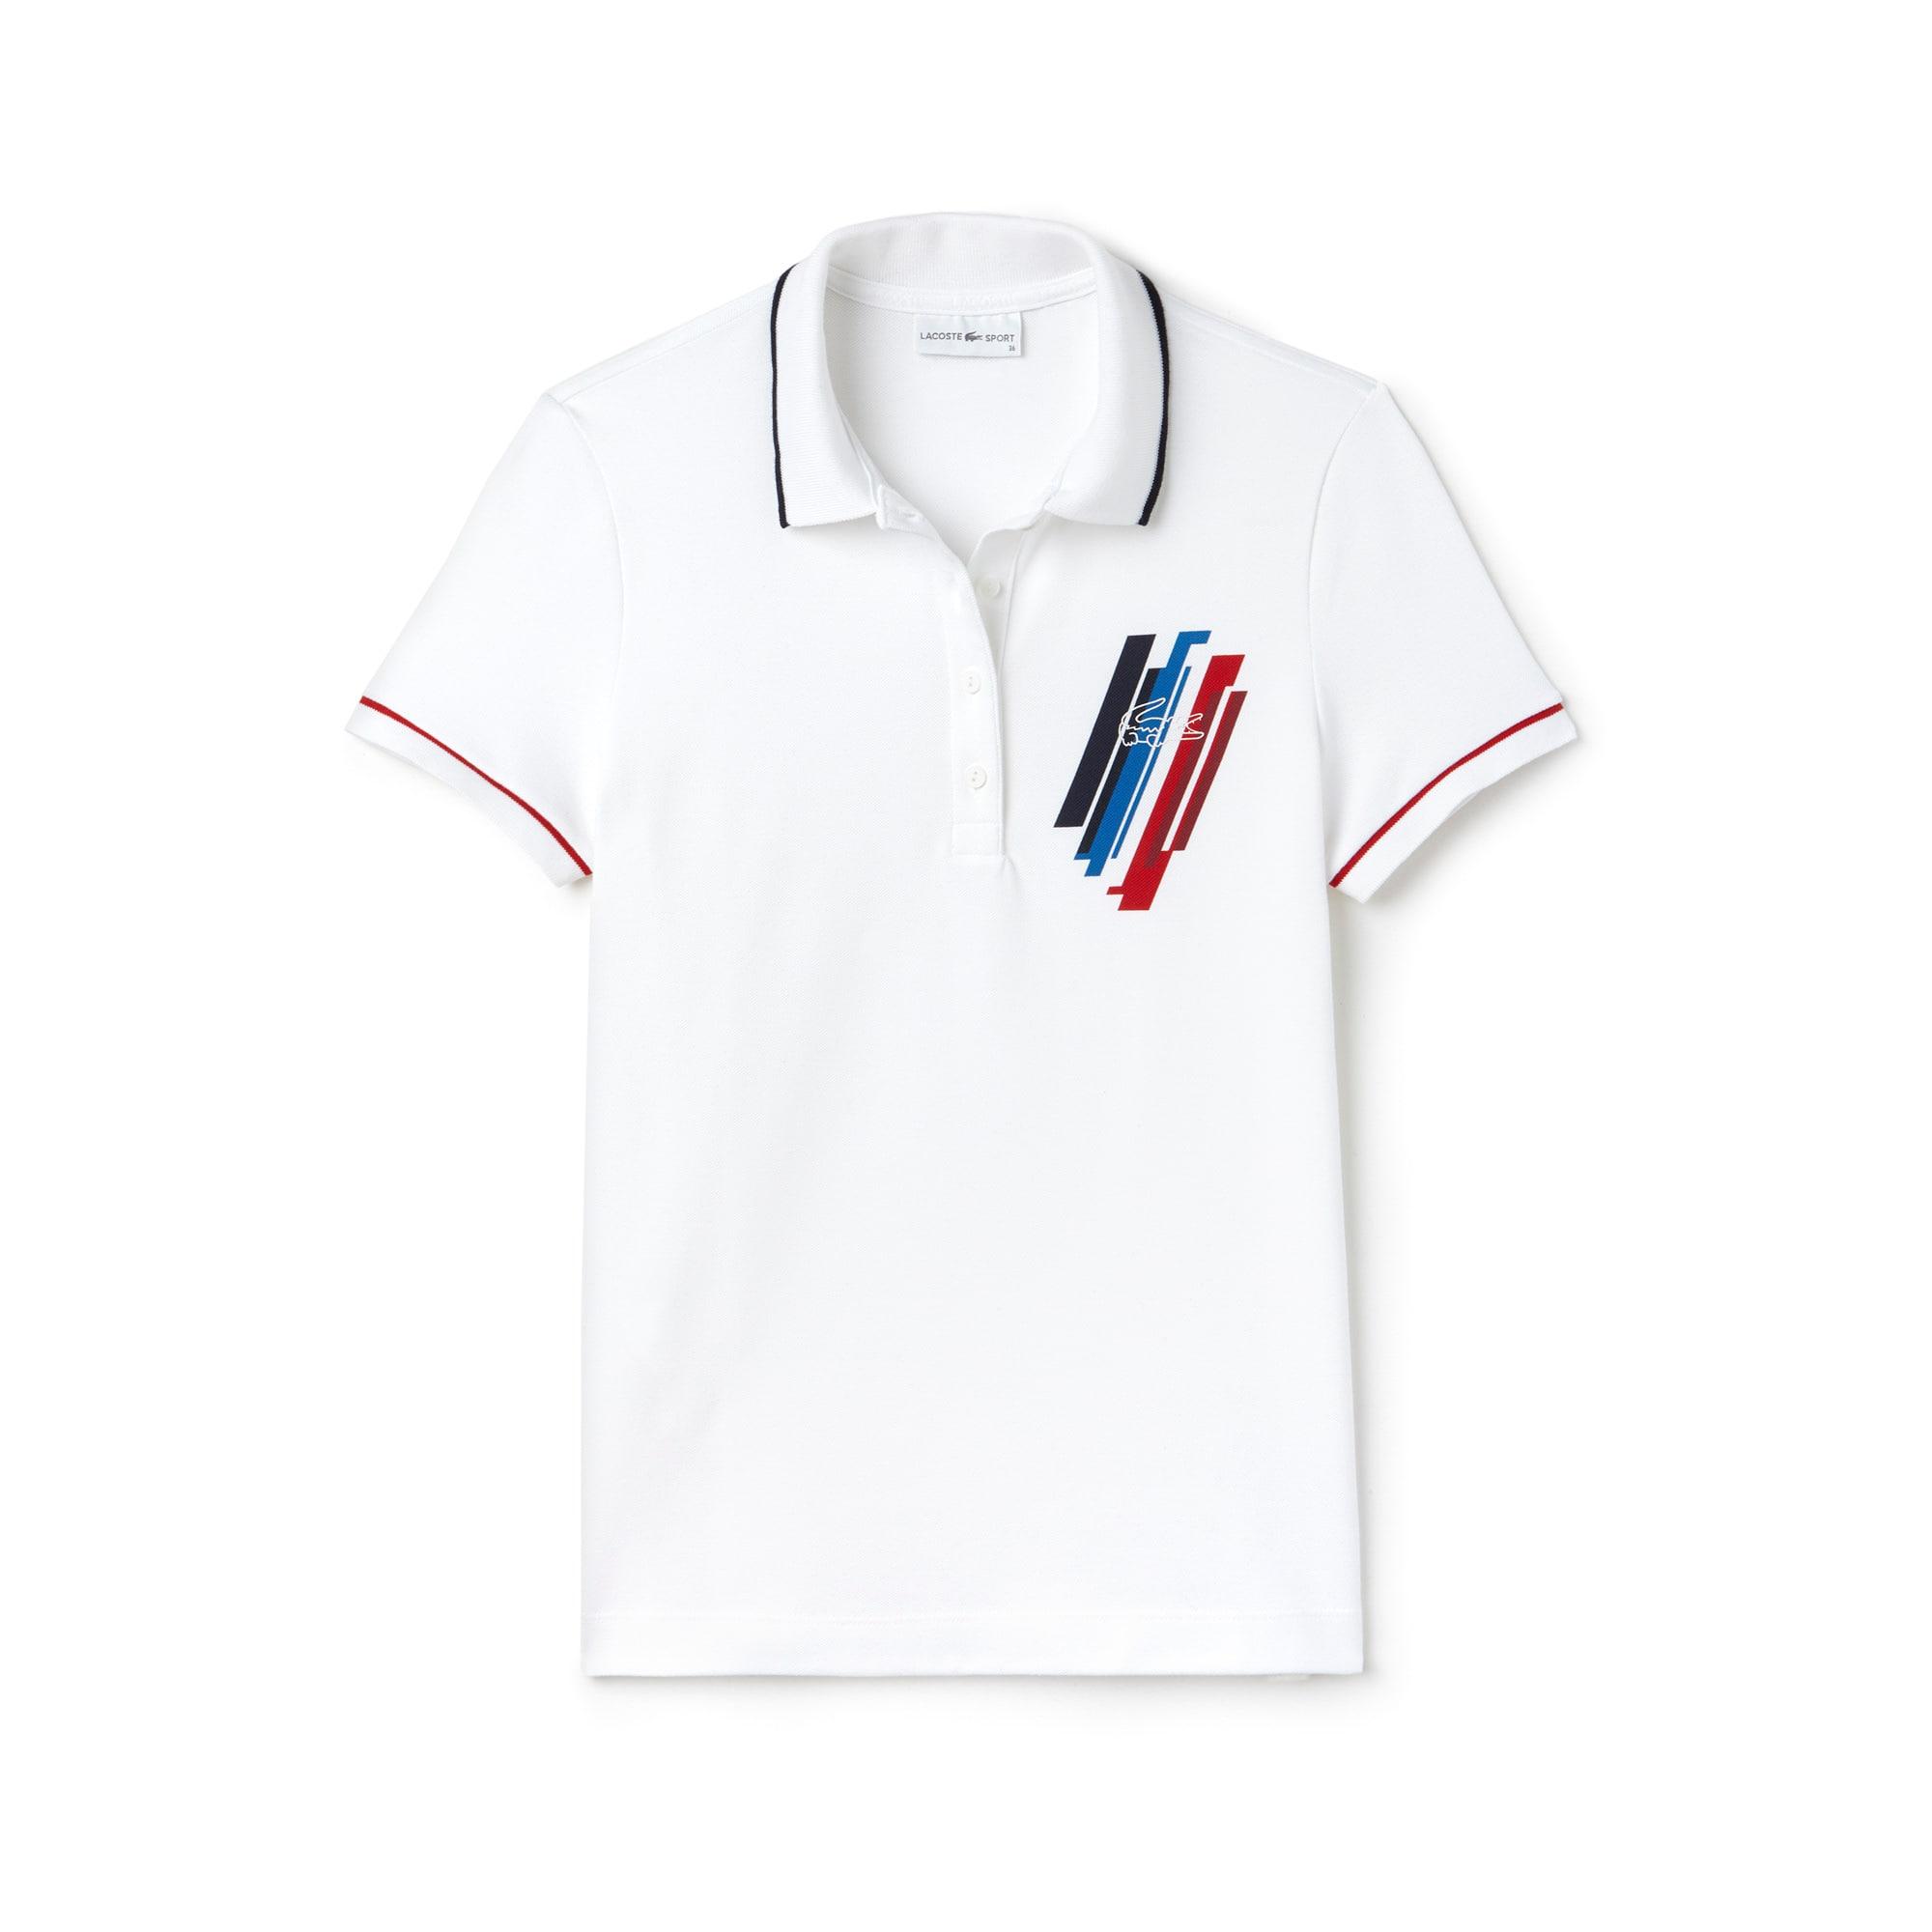 Women's Lacoste SPORT COLLECTION TRICOLORE Edition Stretch Mini Piqué Polo Shirt